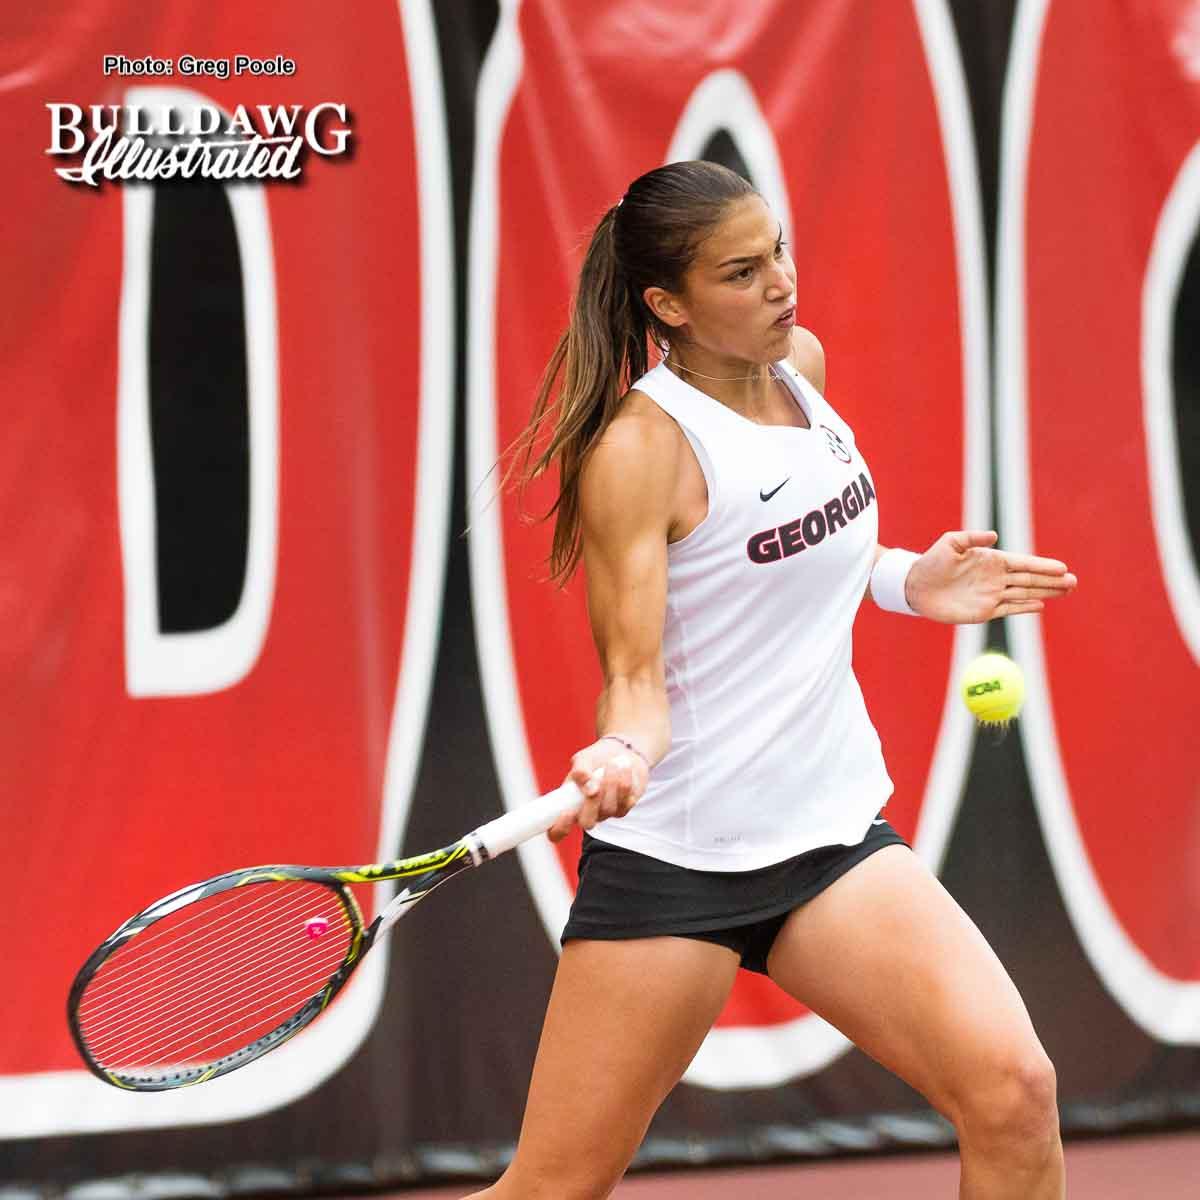 Elena Christofi  - UGA Women's Tennis Team -